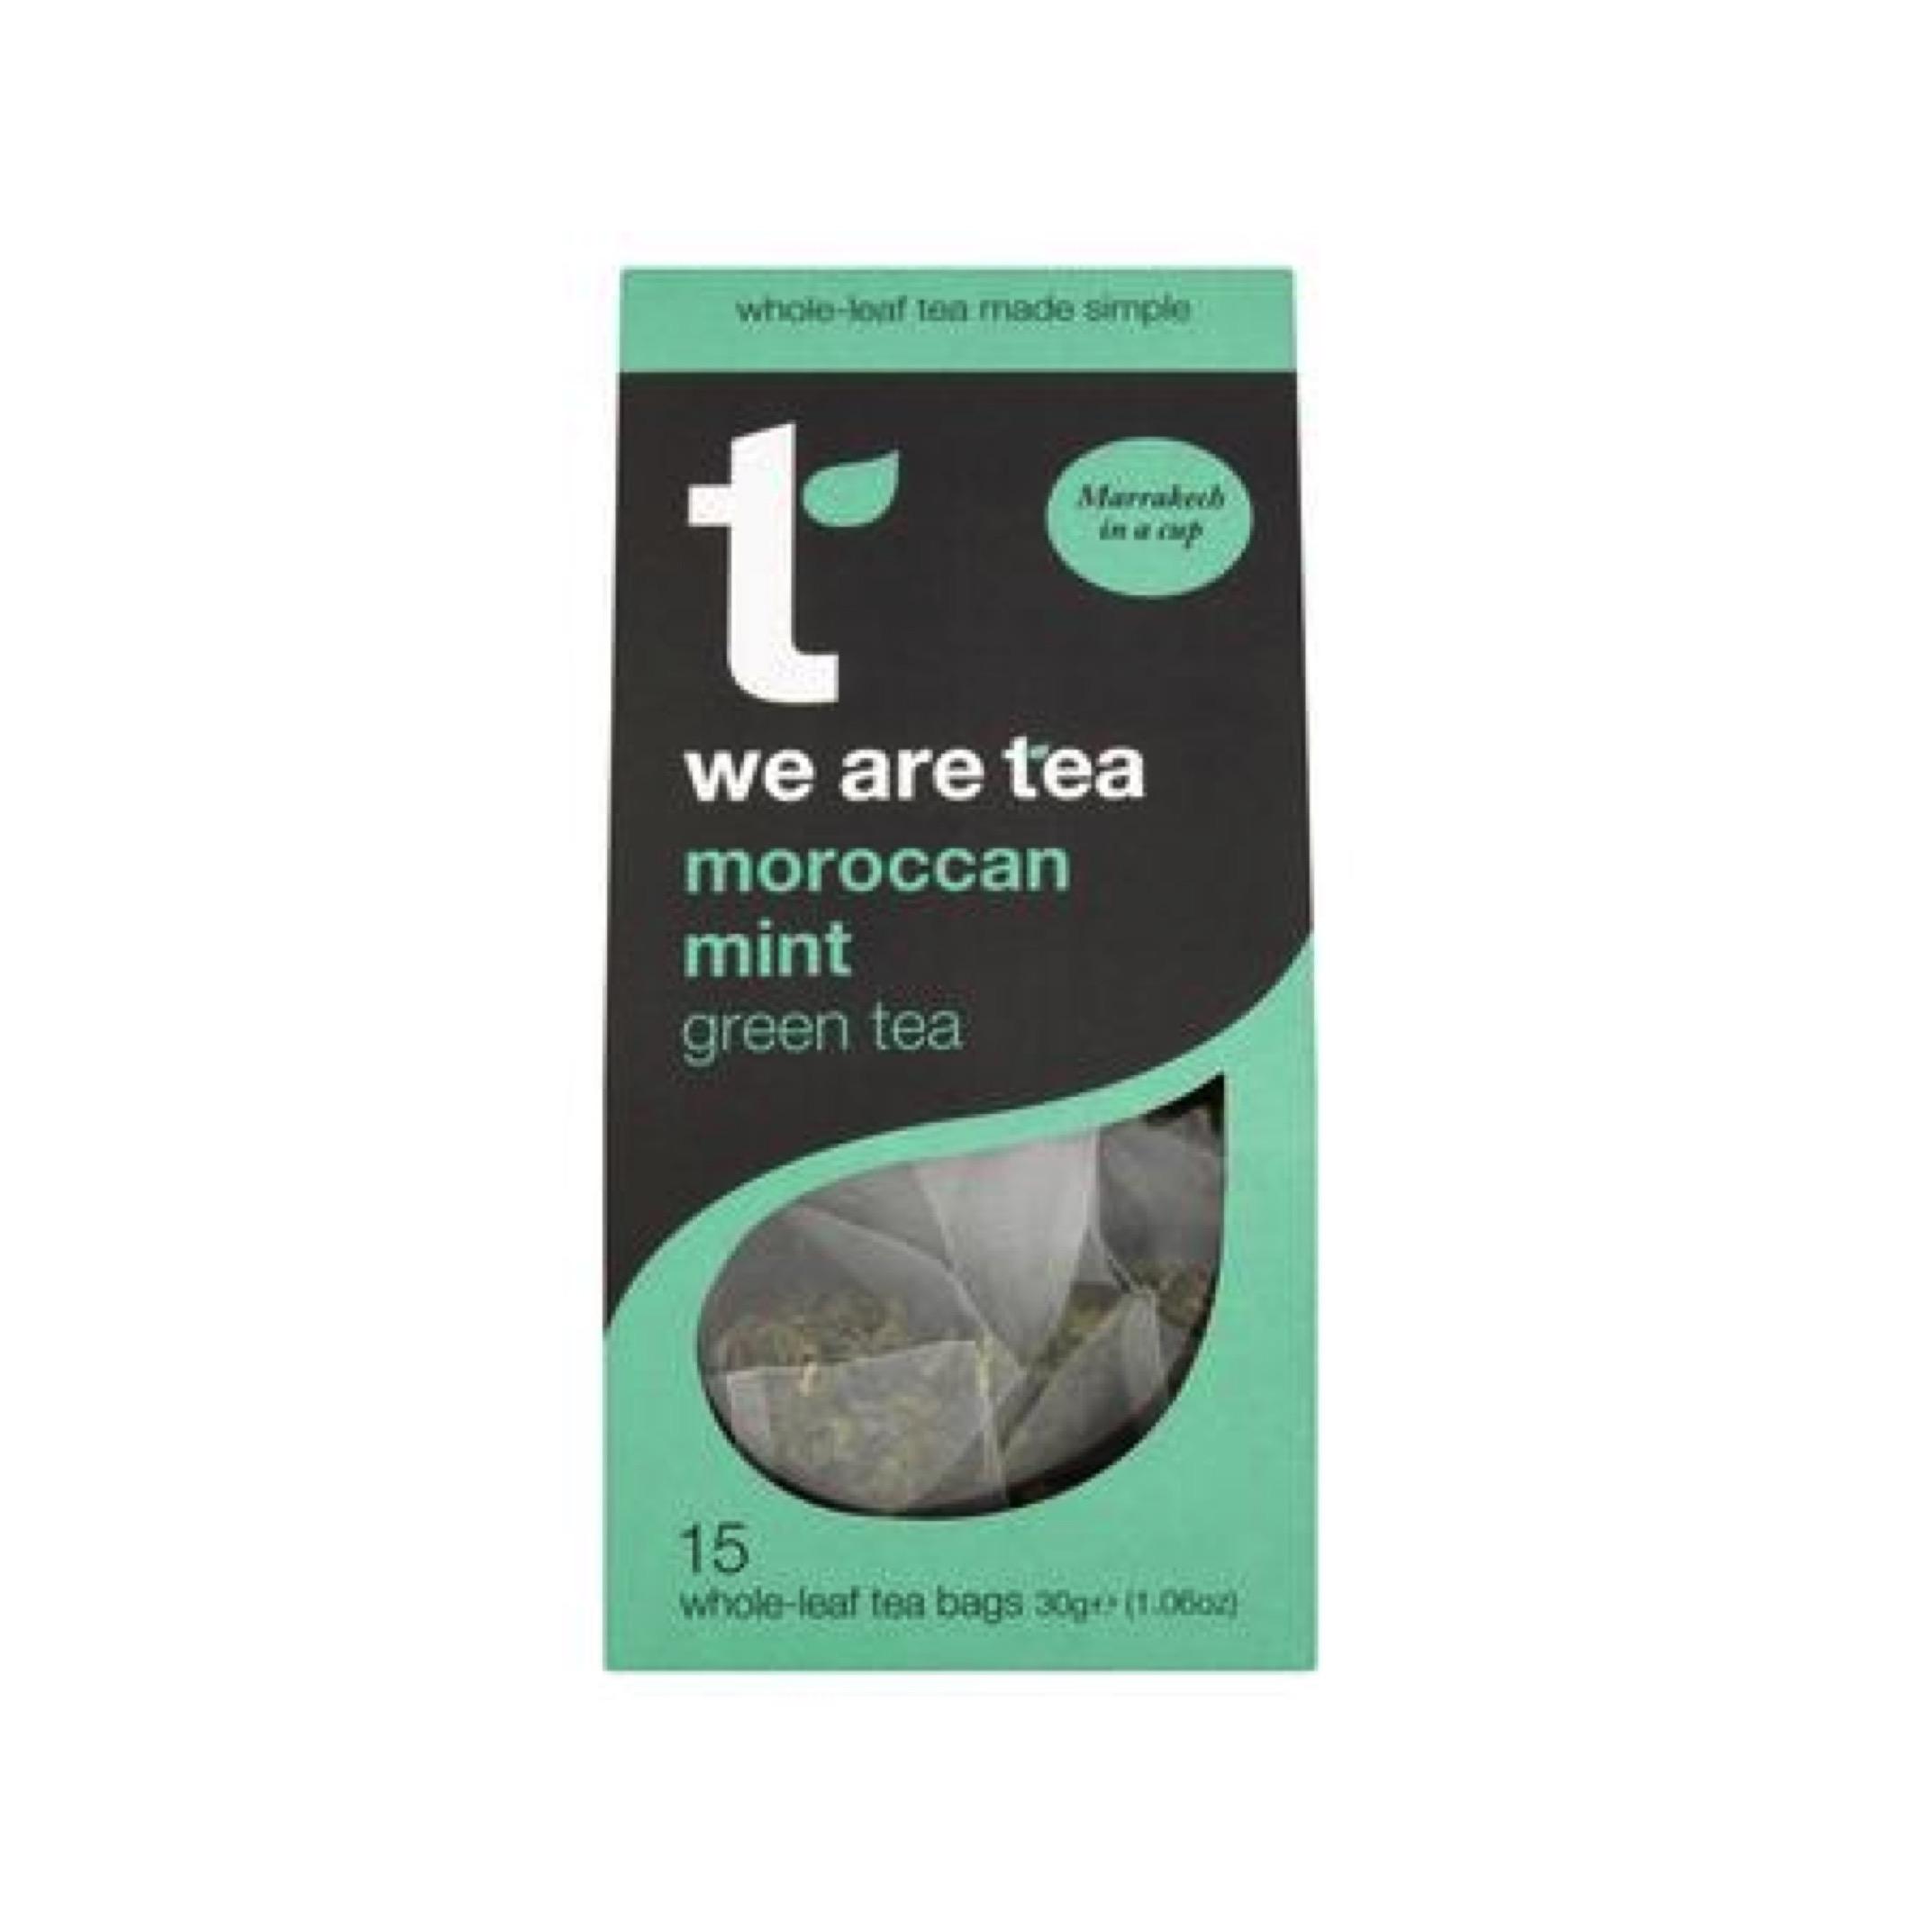 WE ARE TEA